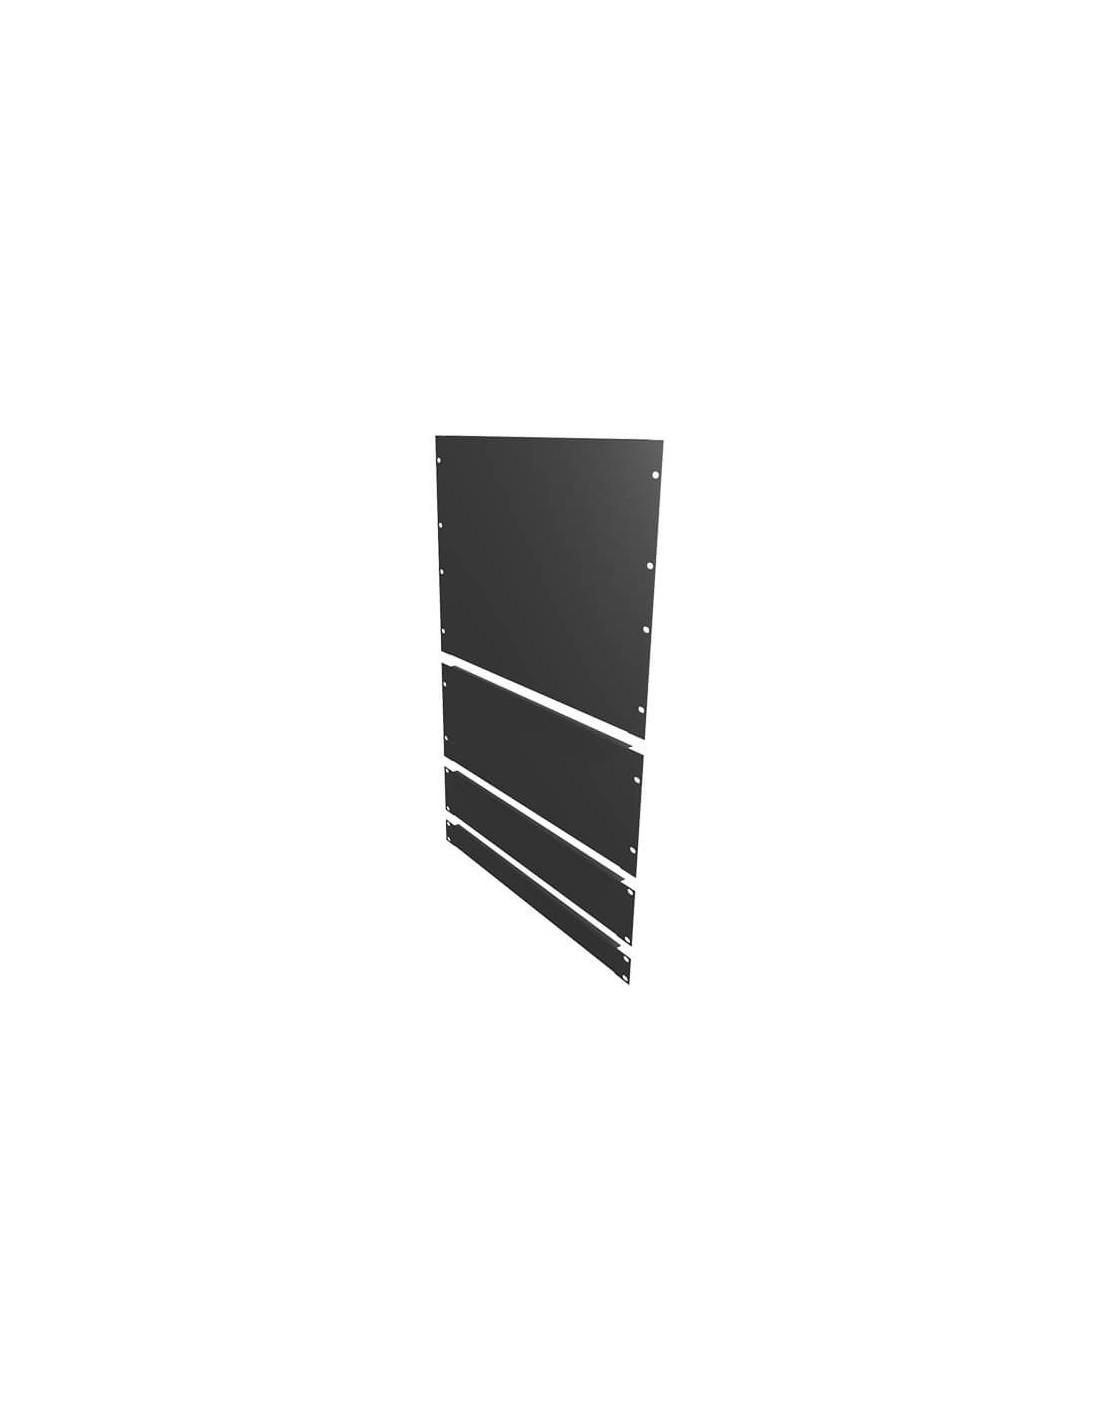 NETGEAR ReadyNAS 524X (Sin discos) 4 bahías Dual Core 2.2GHz Procesador Intel D-1508 Server Memoria DDR4 ECC